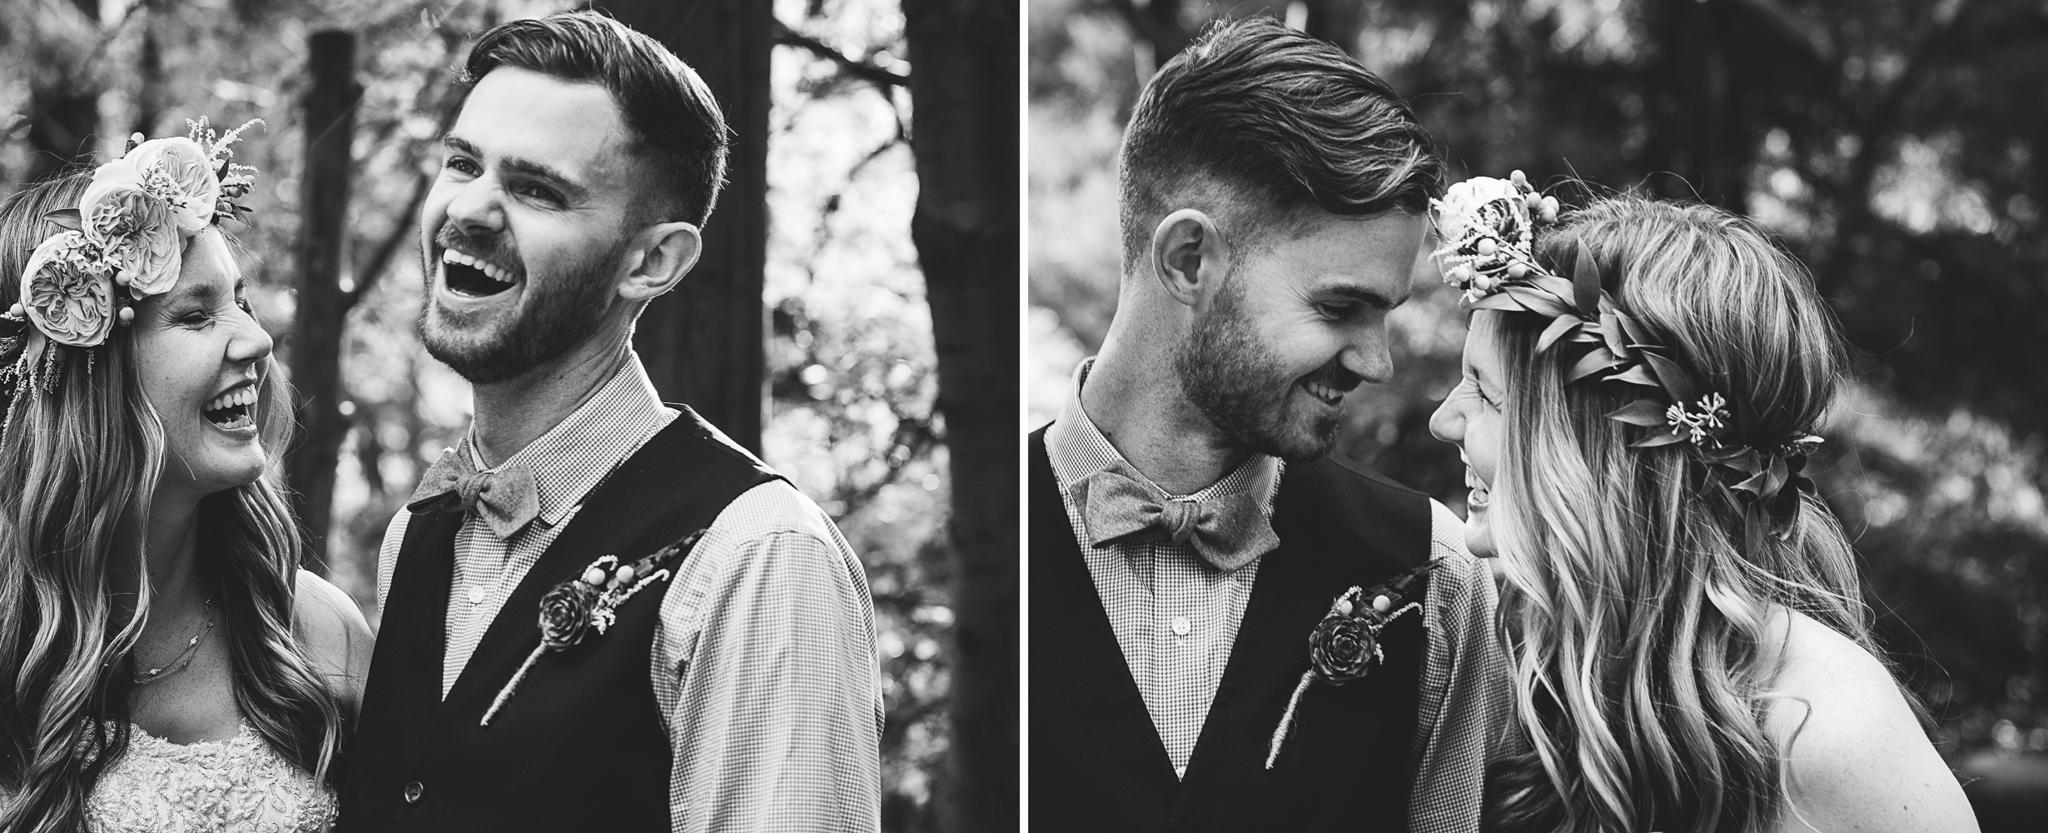 ©Isaiah & Taylor Photography - Pine Rose Cabin - Lake Arrowhead - Los Angeles Wedding Photographer-054.jpg